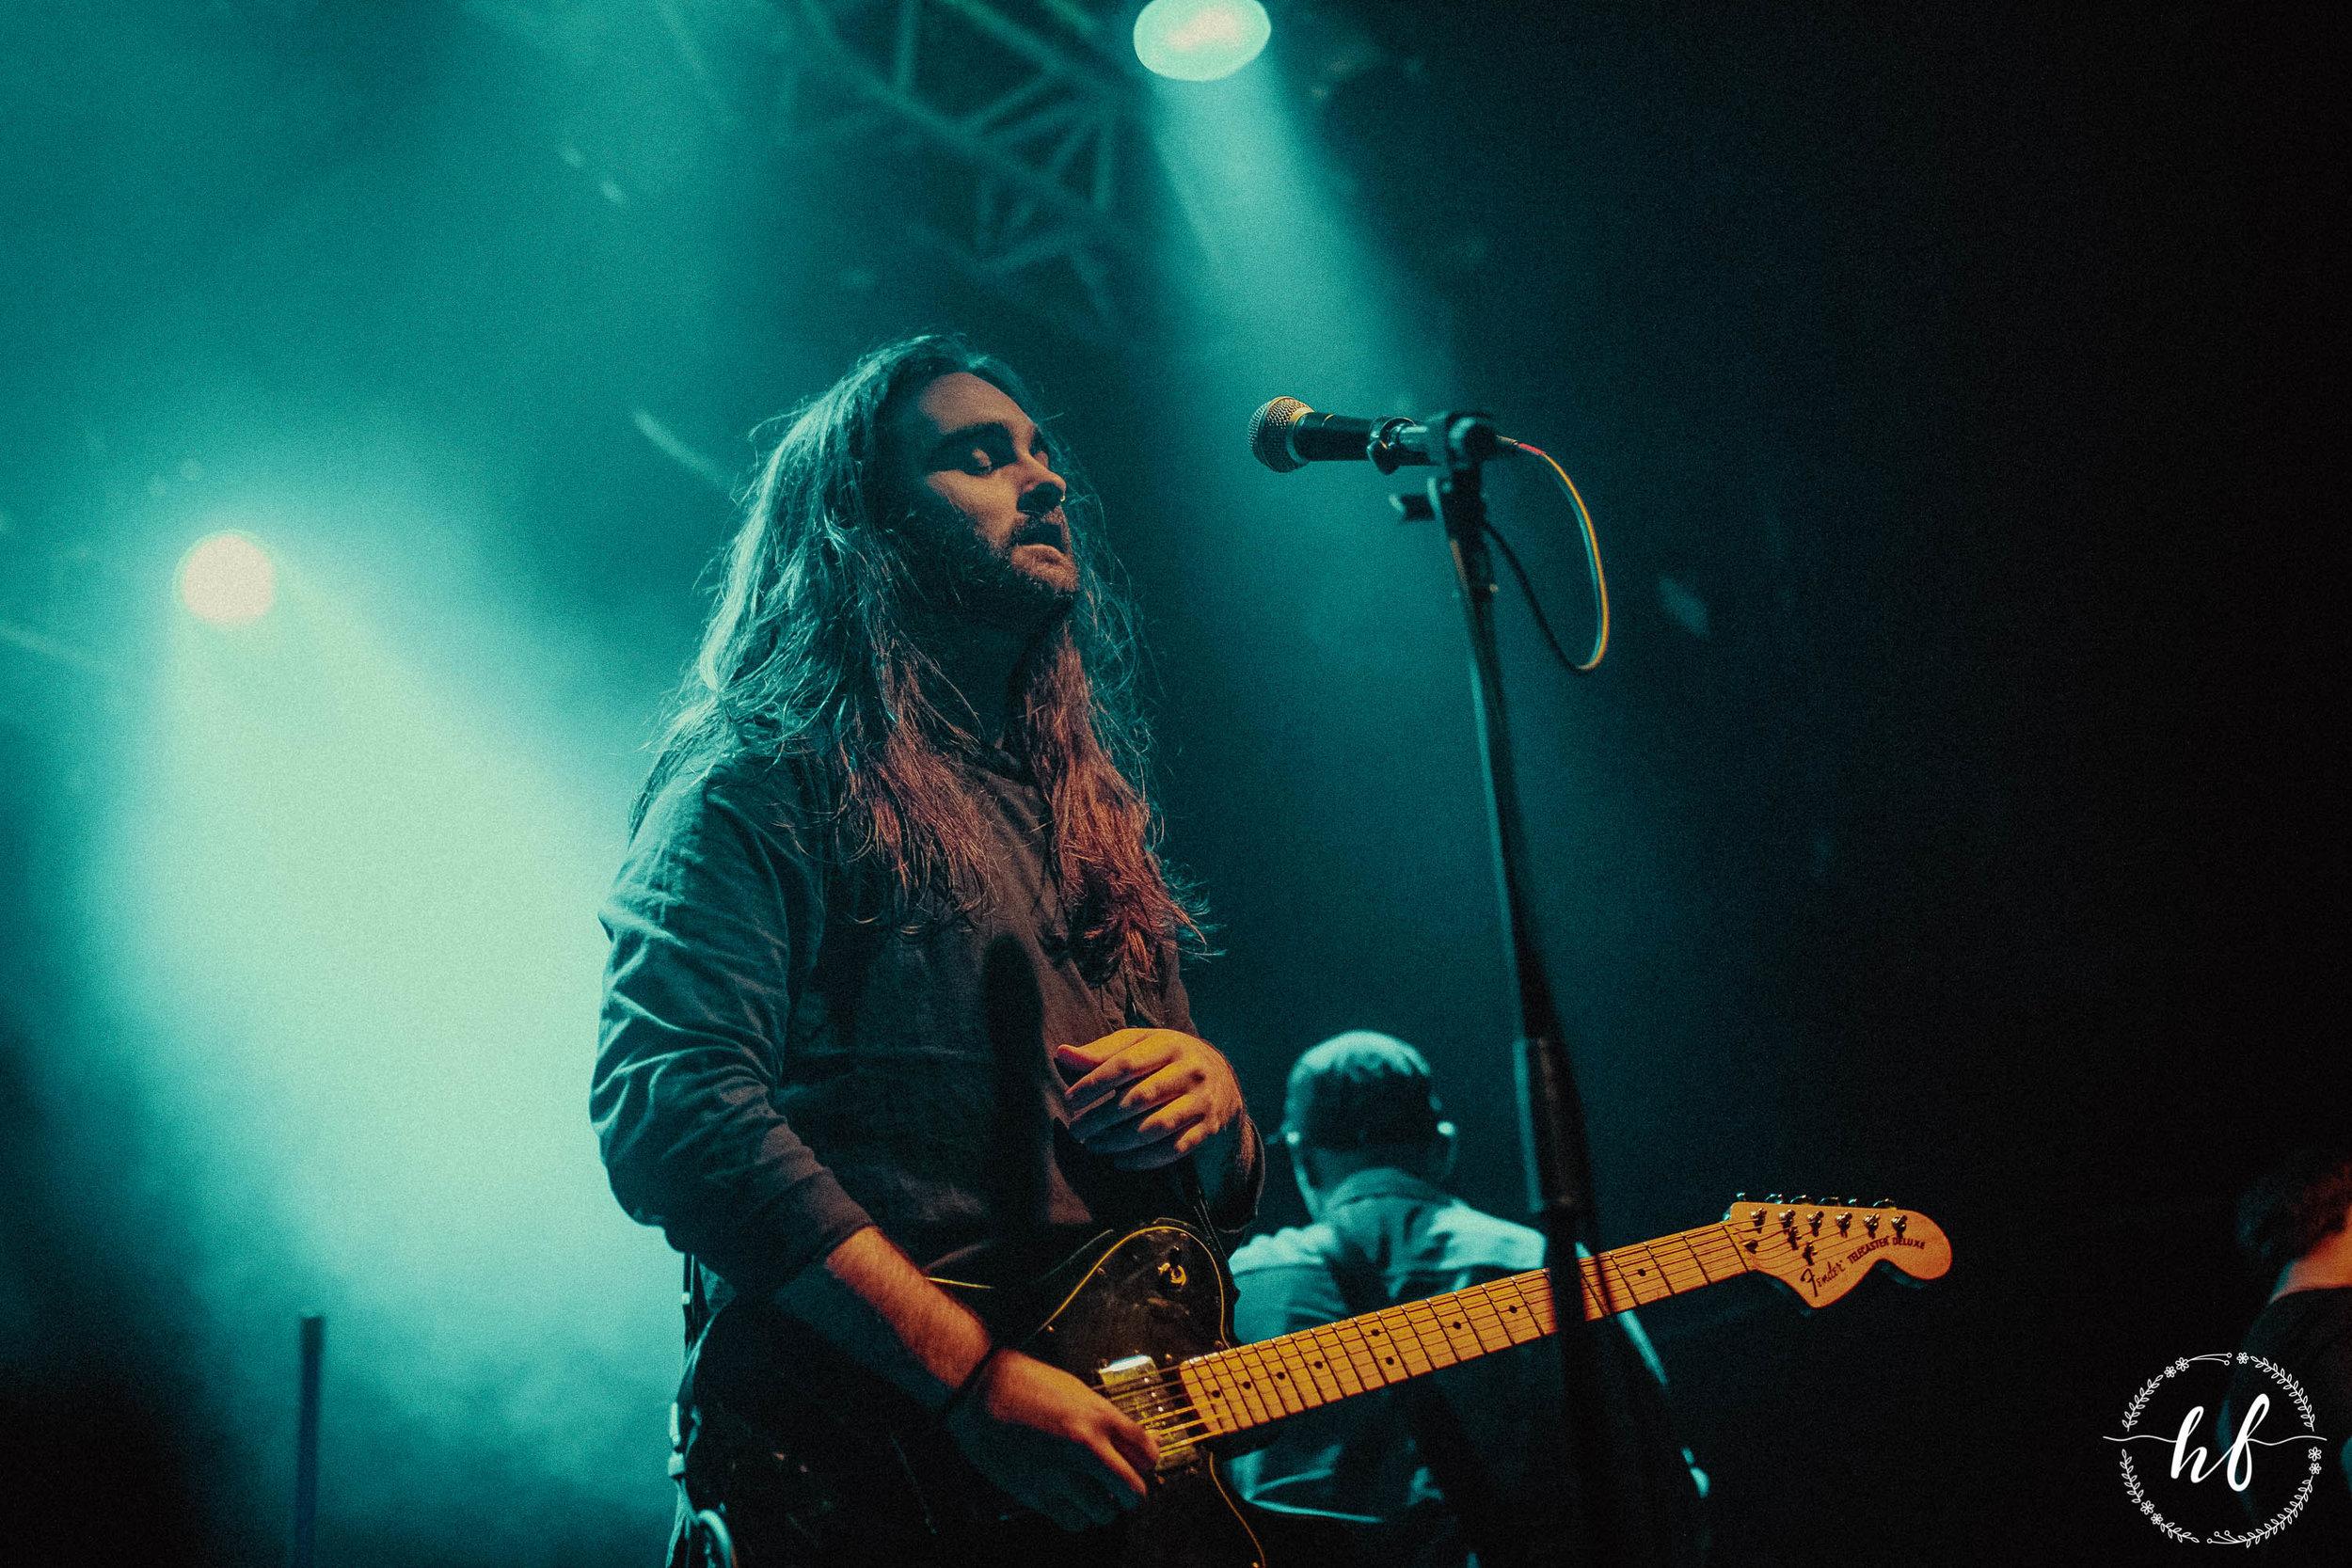 Wallflower - Electric Ballroom - 22-09-2018 - London -5.jpg